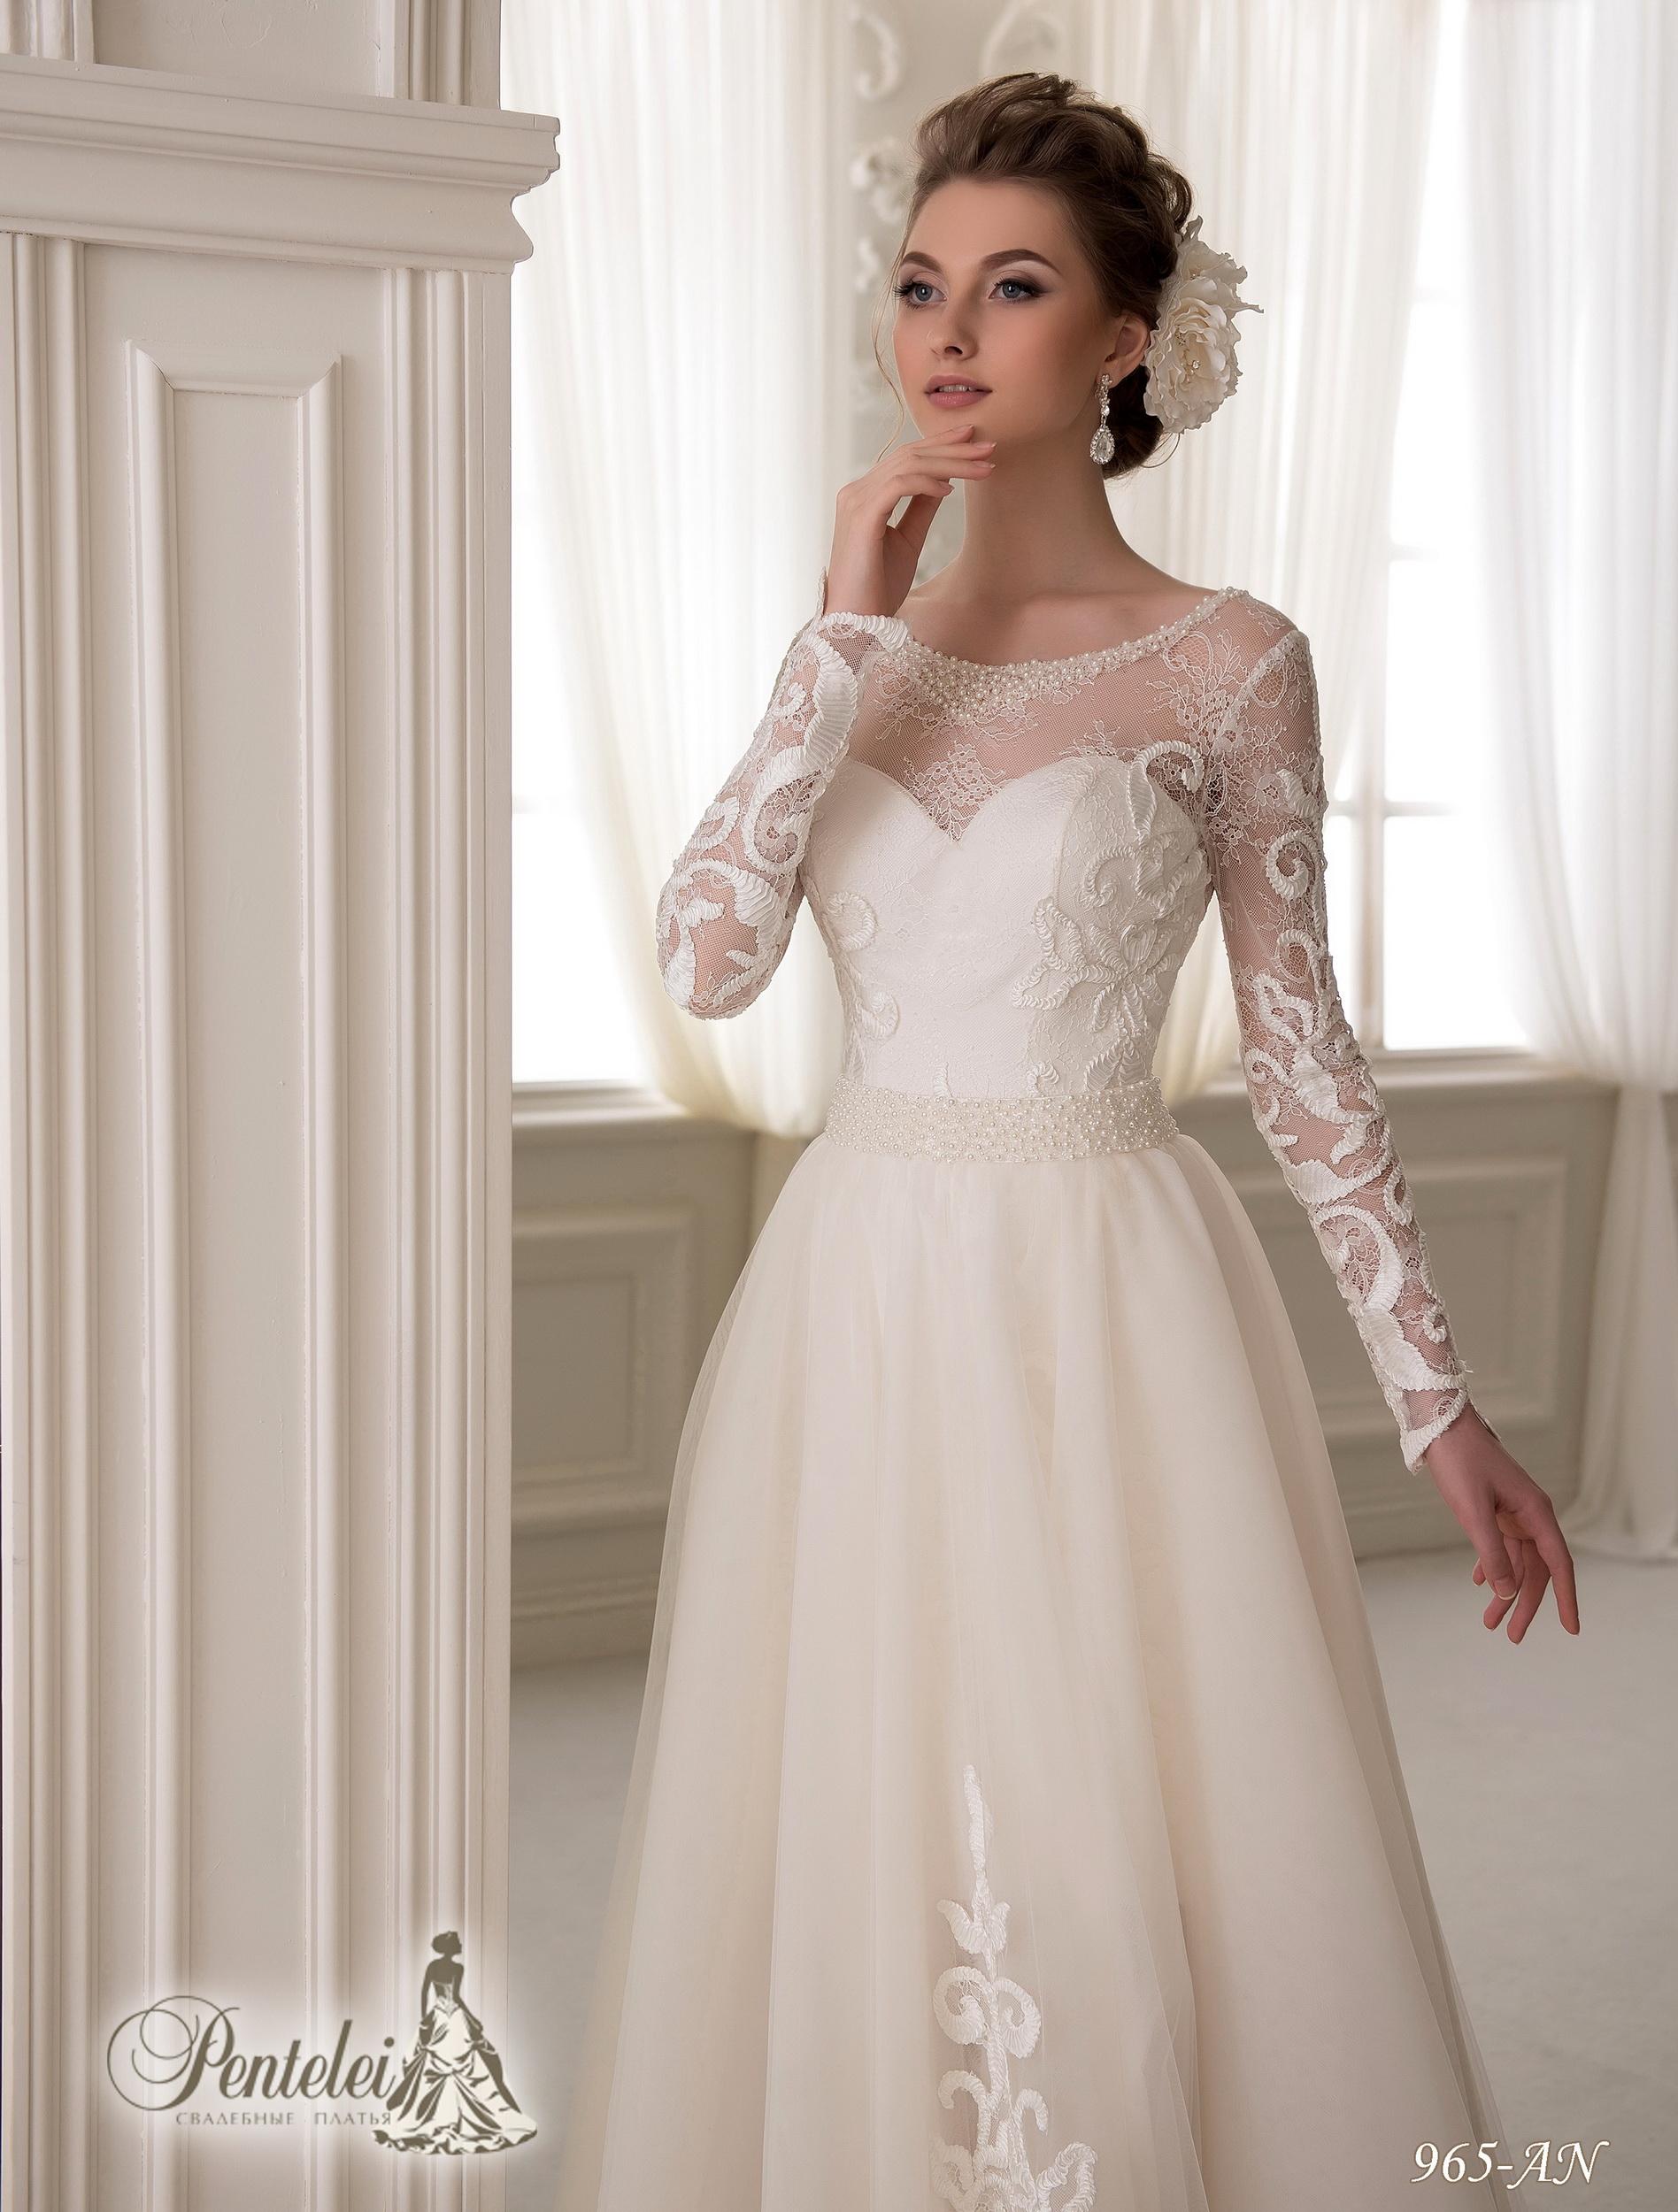 965-AN | Cumpăra rochii de mireasă en-gros de Pentelei